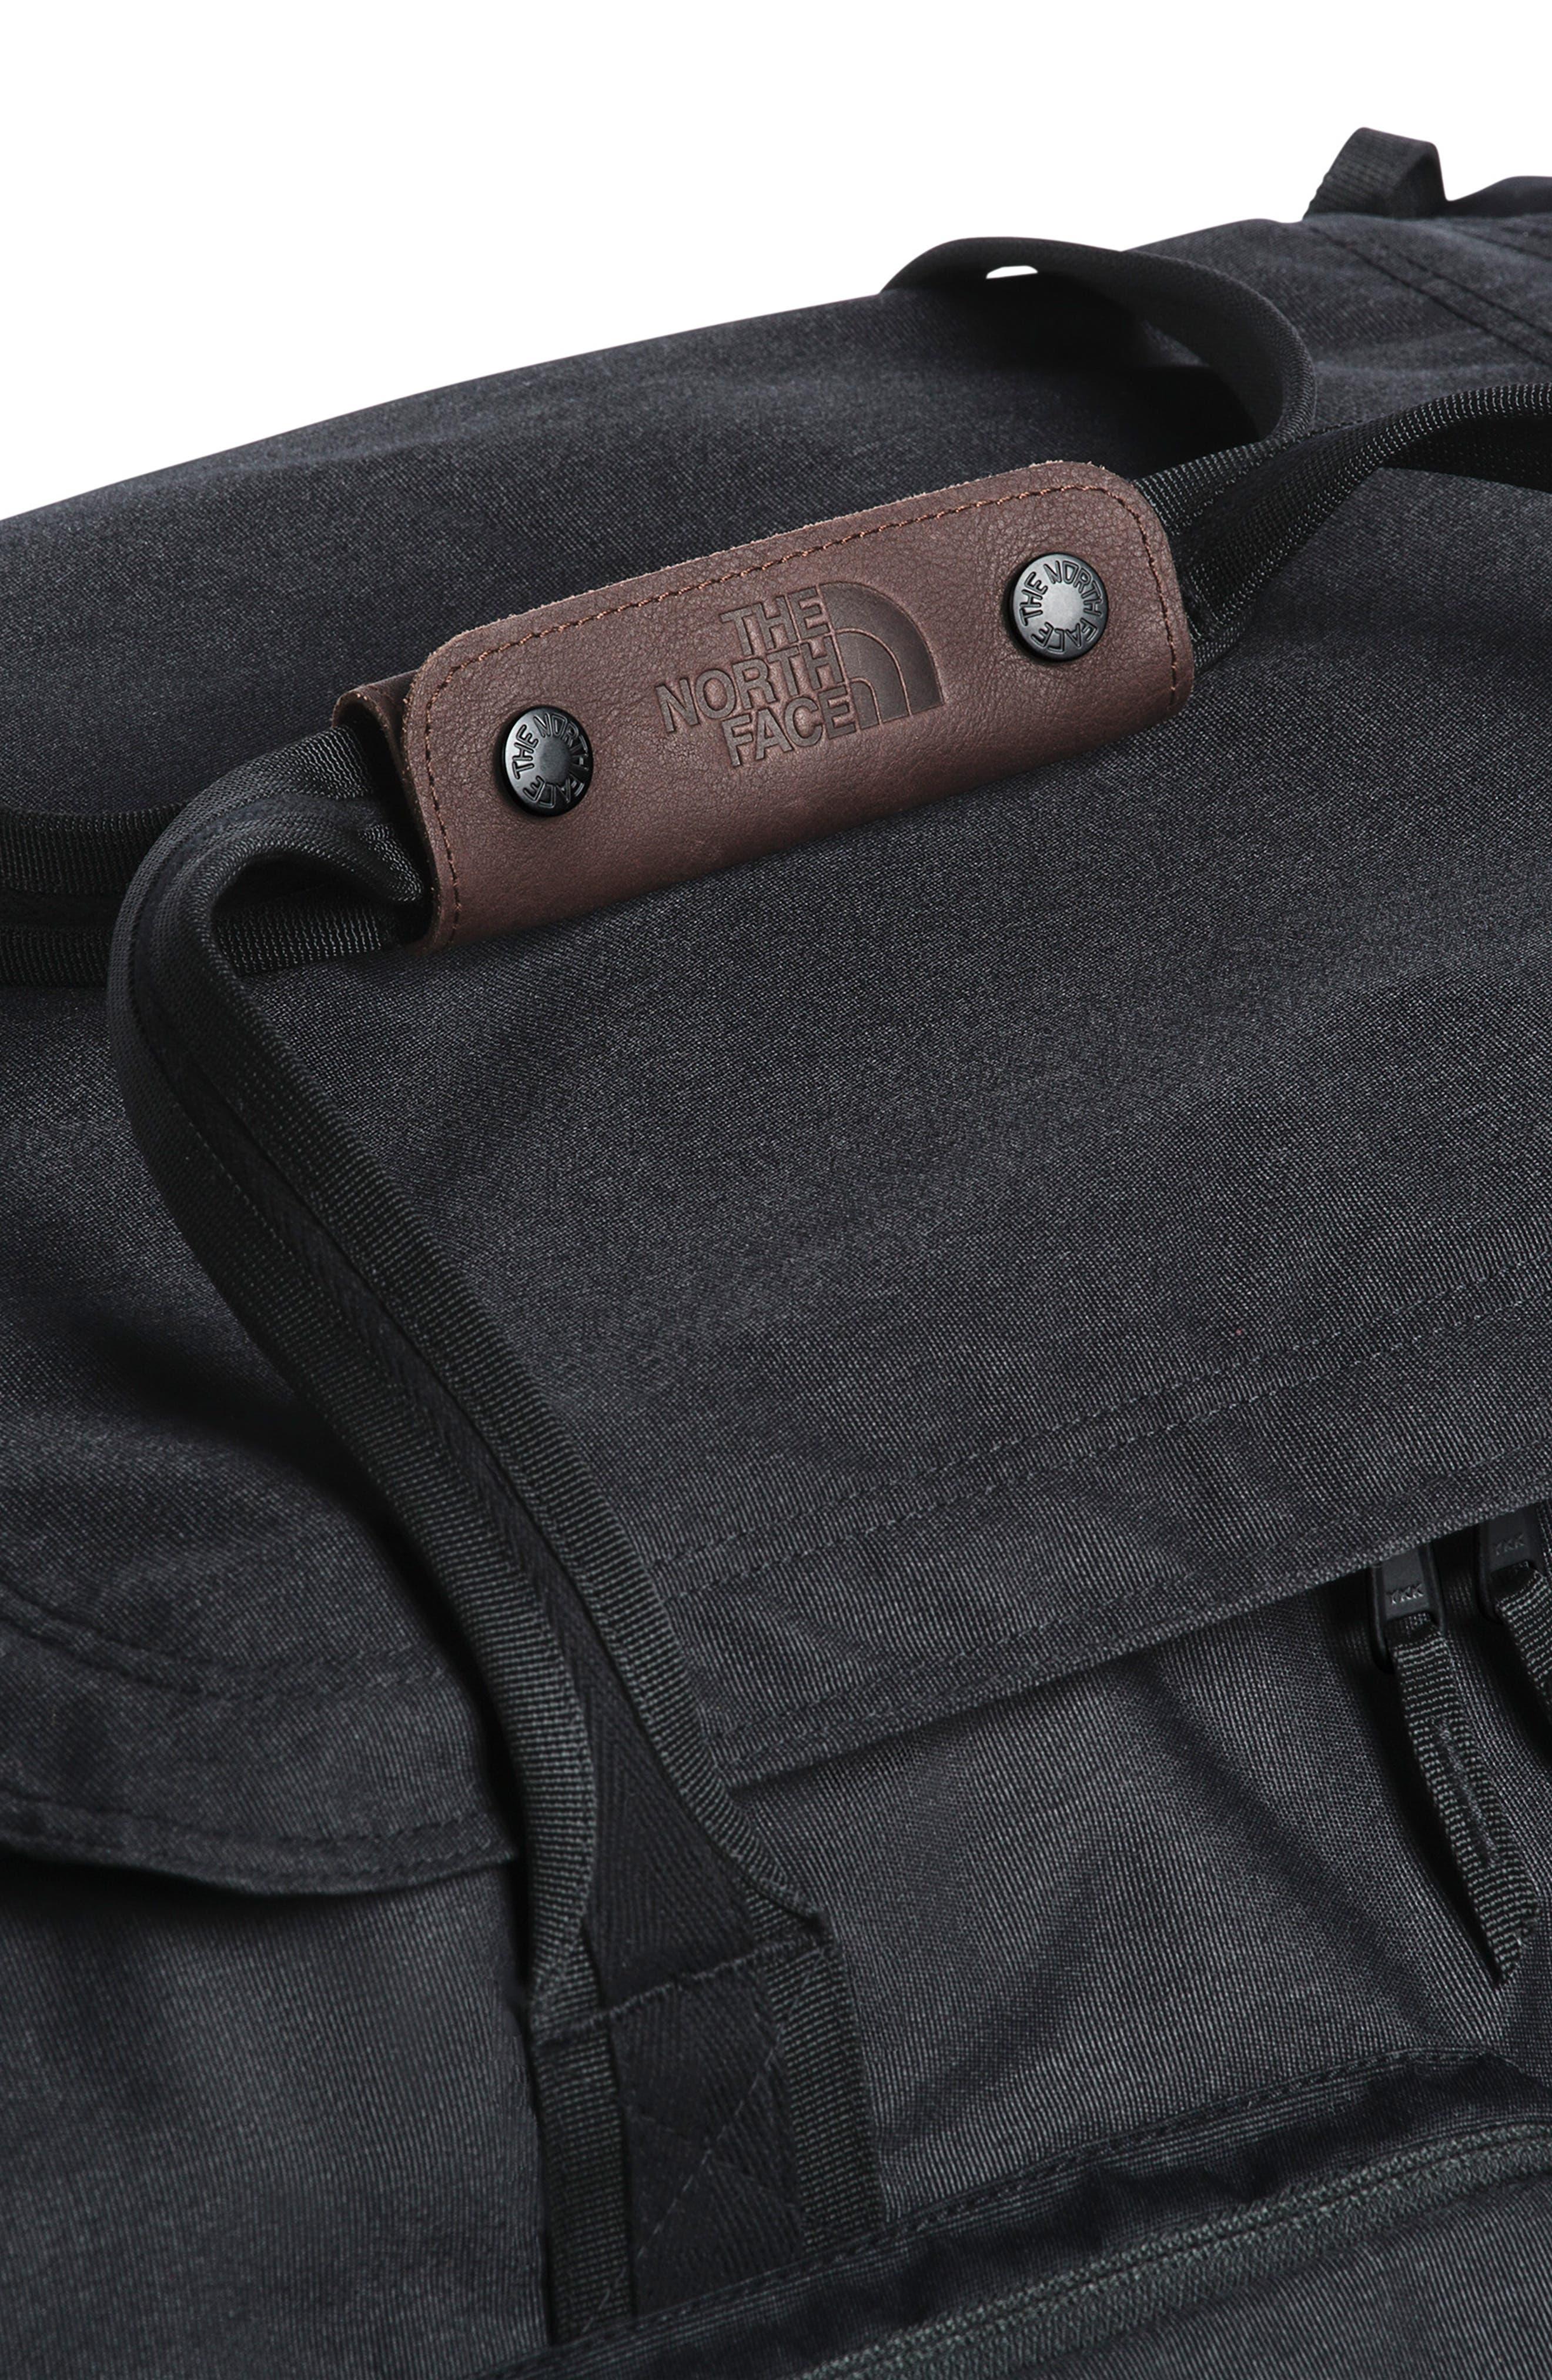 THE NORTH FACE, Berkeley Duffle Bag, Alternate thumbnail 4, color, BLACK HEATHER